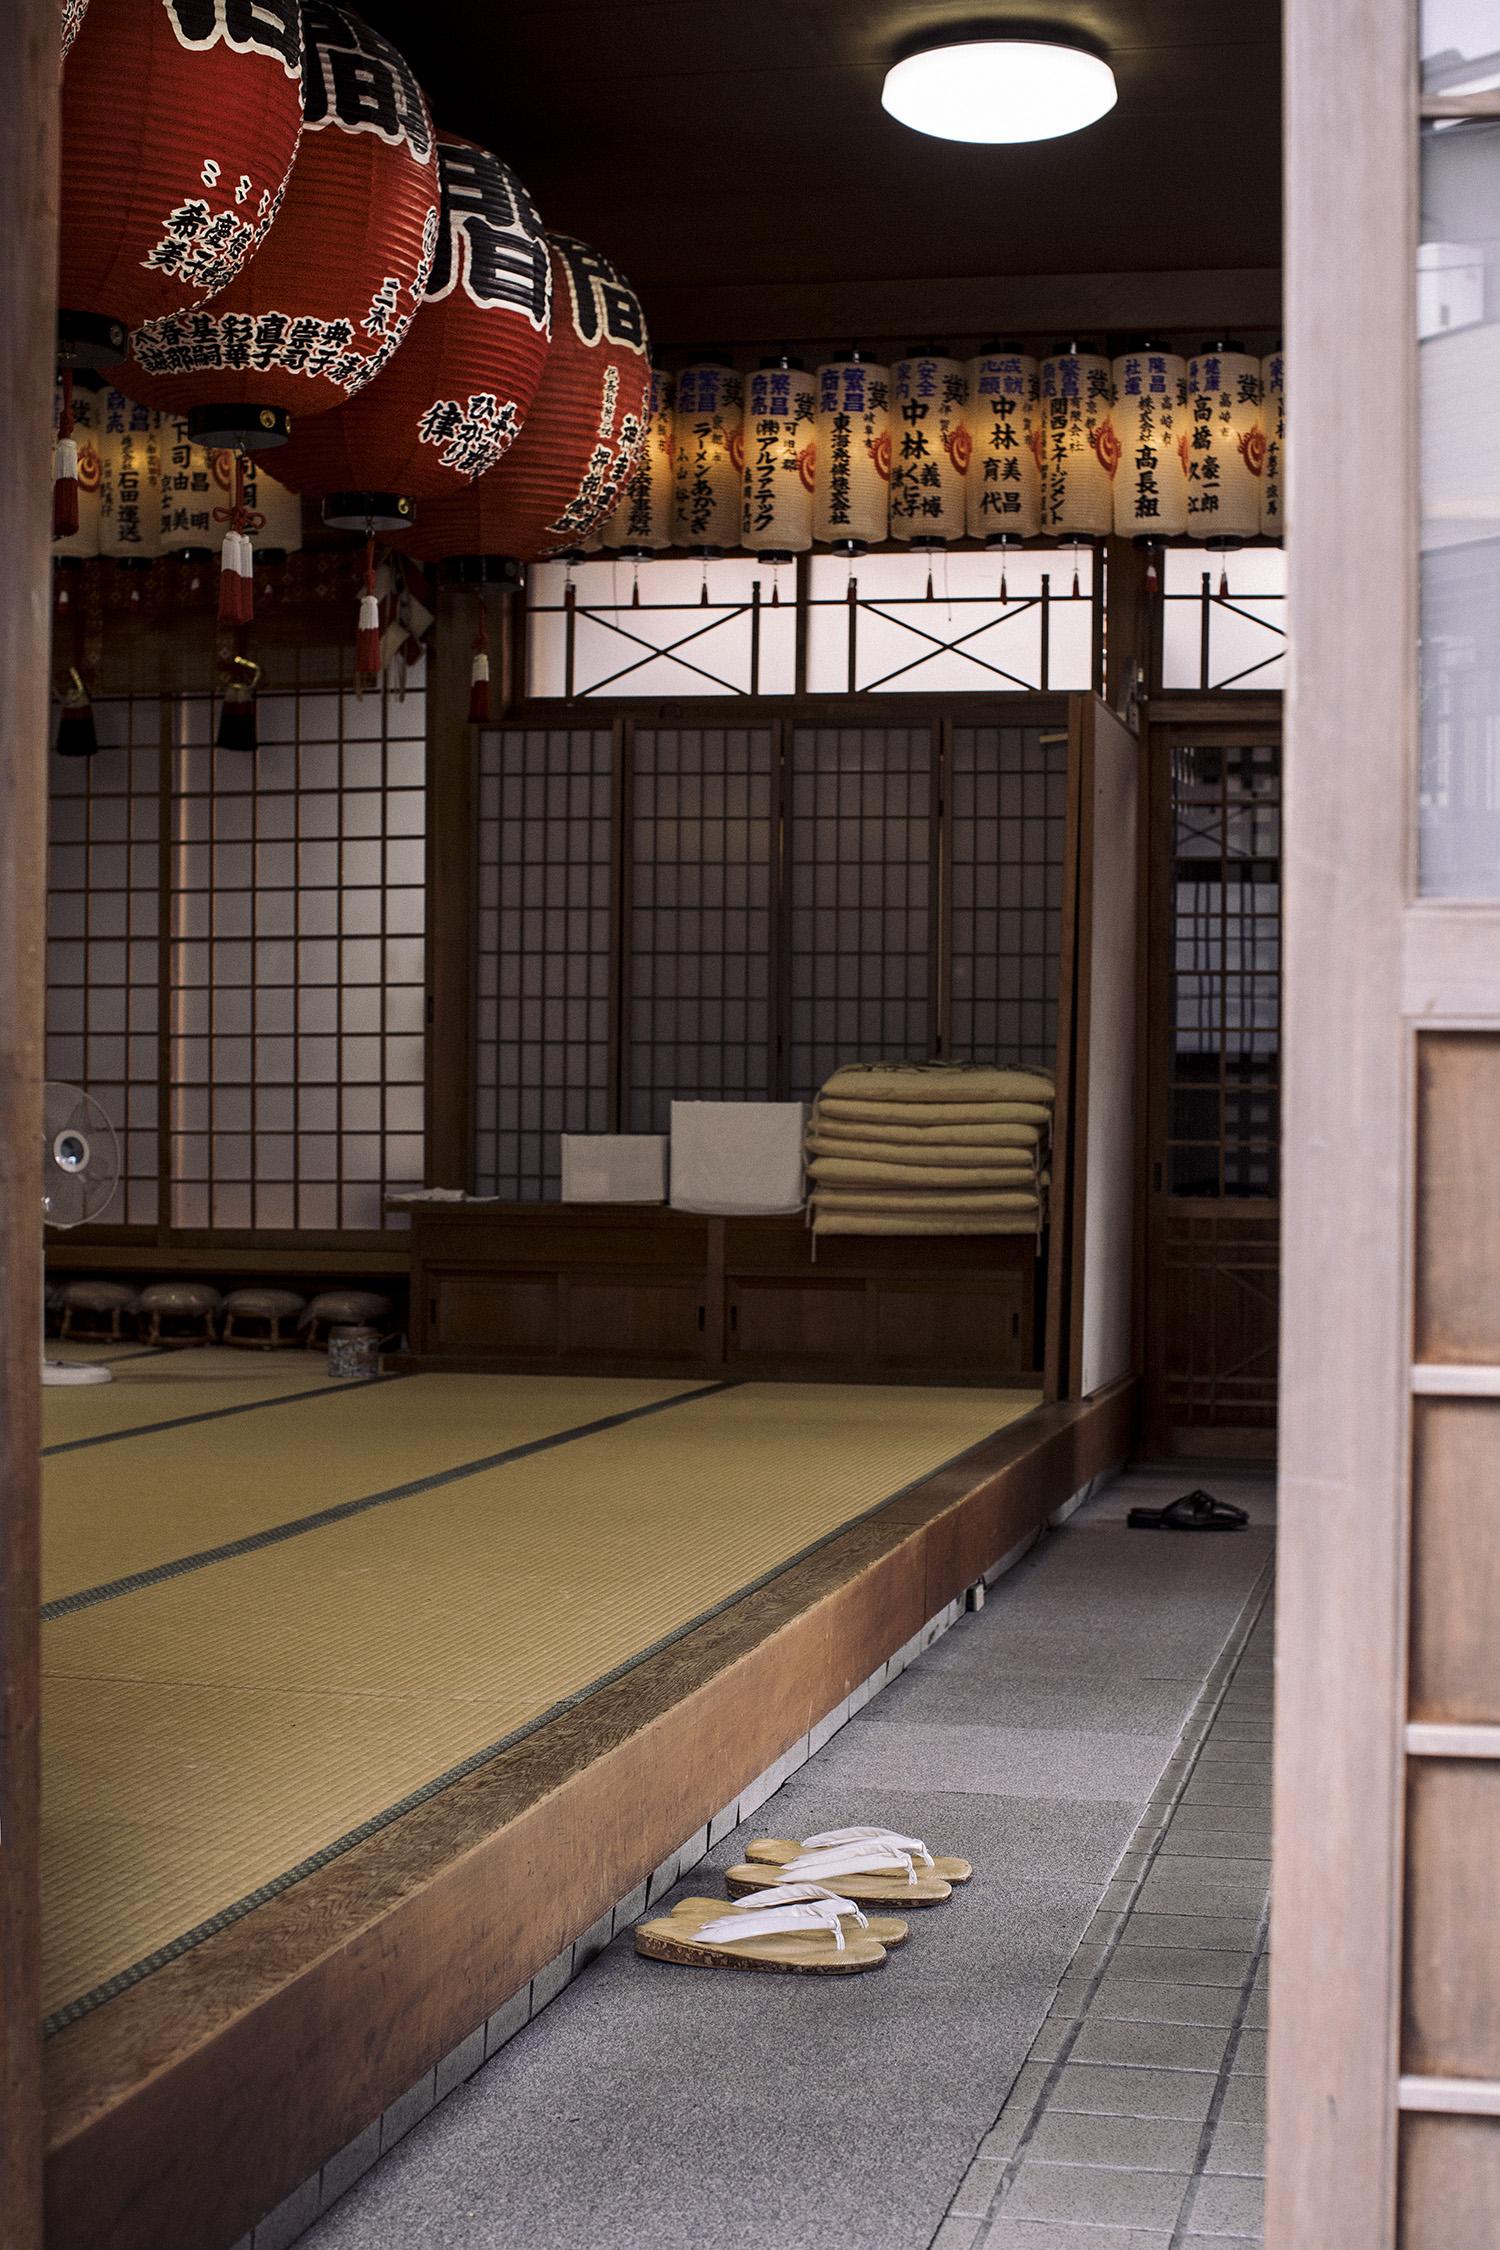 travel-japan-kyoto-washington-dc-malek-naz-photography.jpg